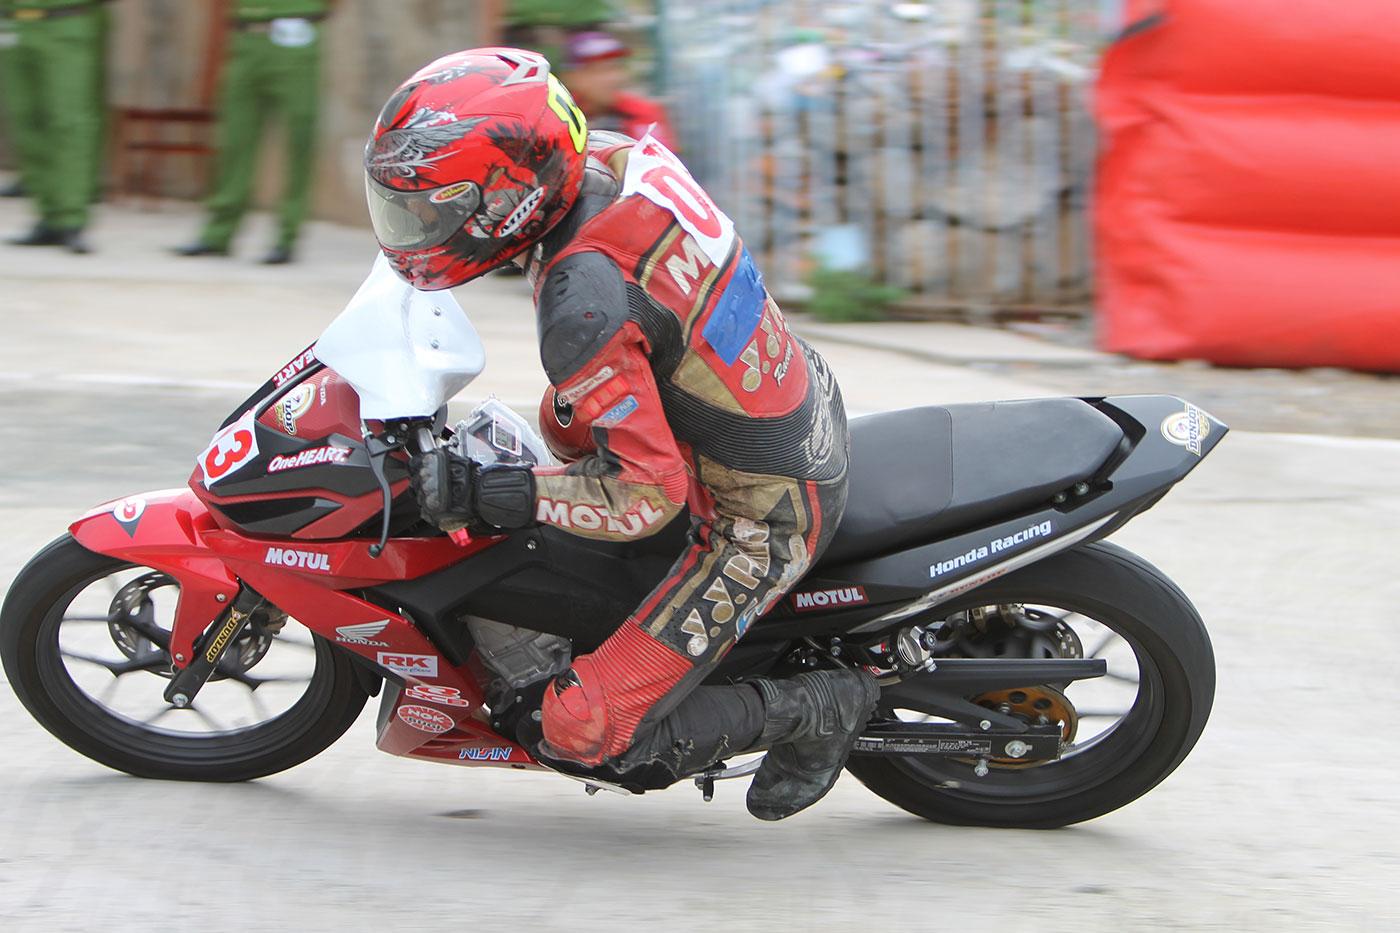 tay-dua-nguyen-thanh-vu-honda-racing-07.jpg